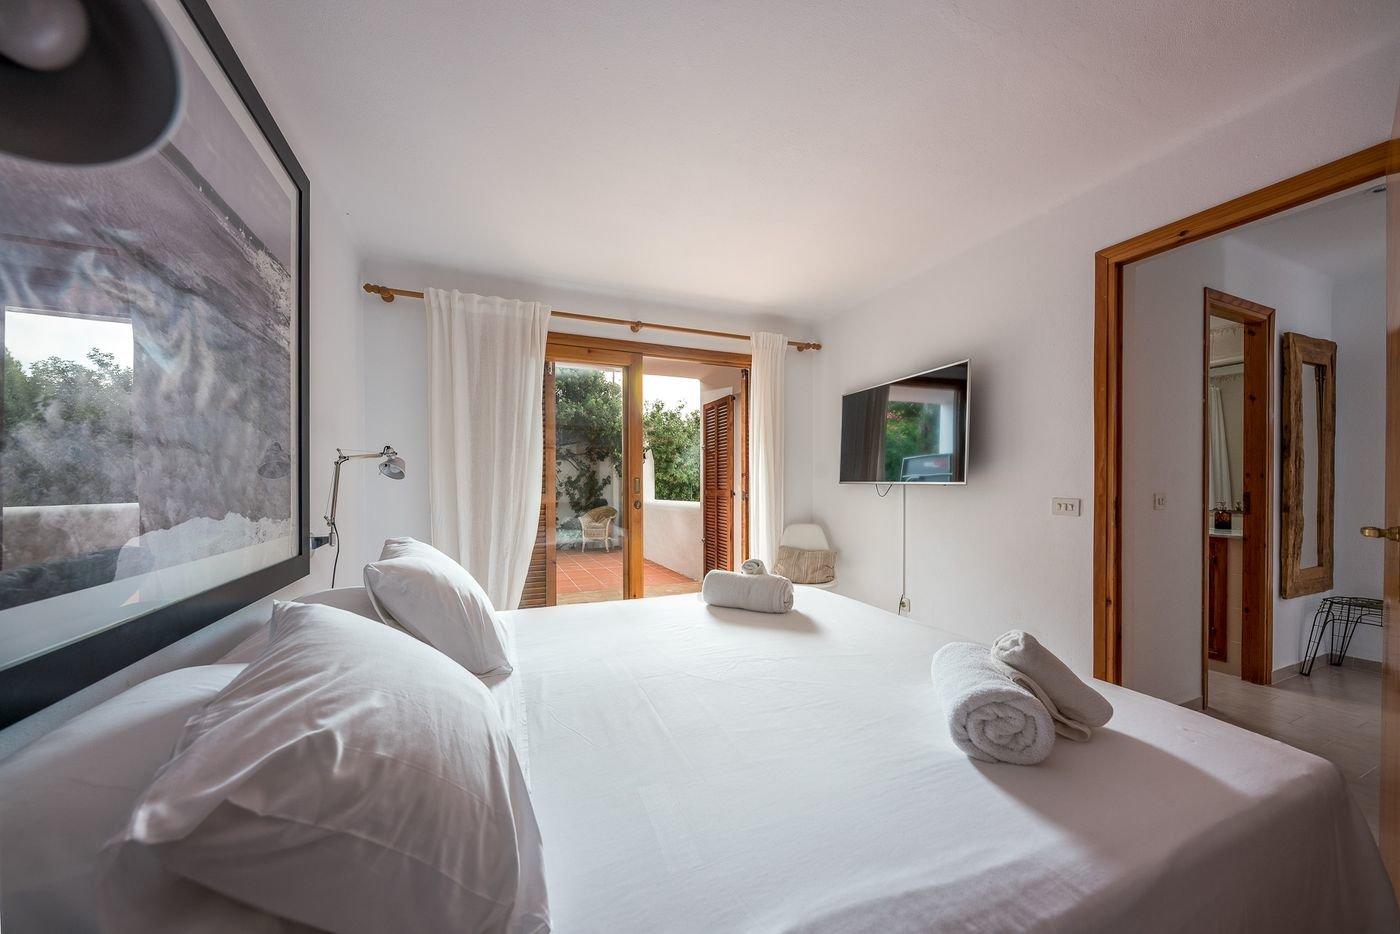 Verkauf Haus - Isla de Ibiza - Spanien